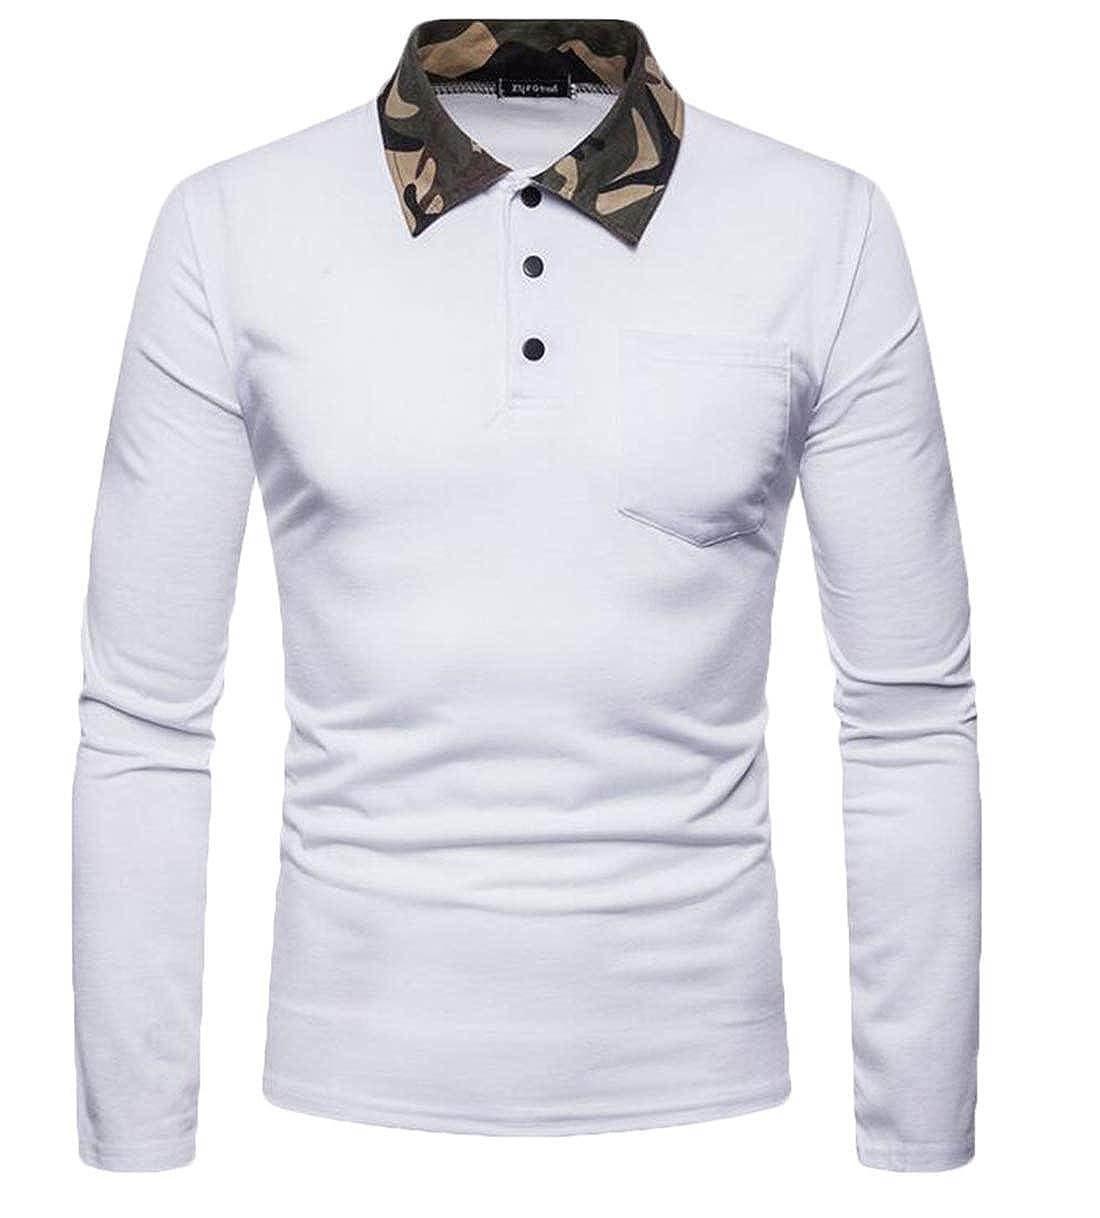 Domple Mens Long Sleeve Contrast Collar Camo Flap Pockets Casual Slim Polo Shirts